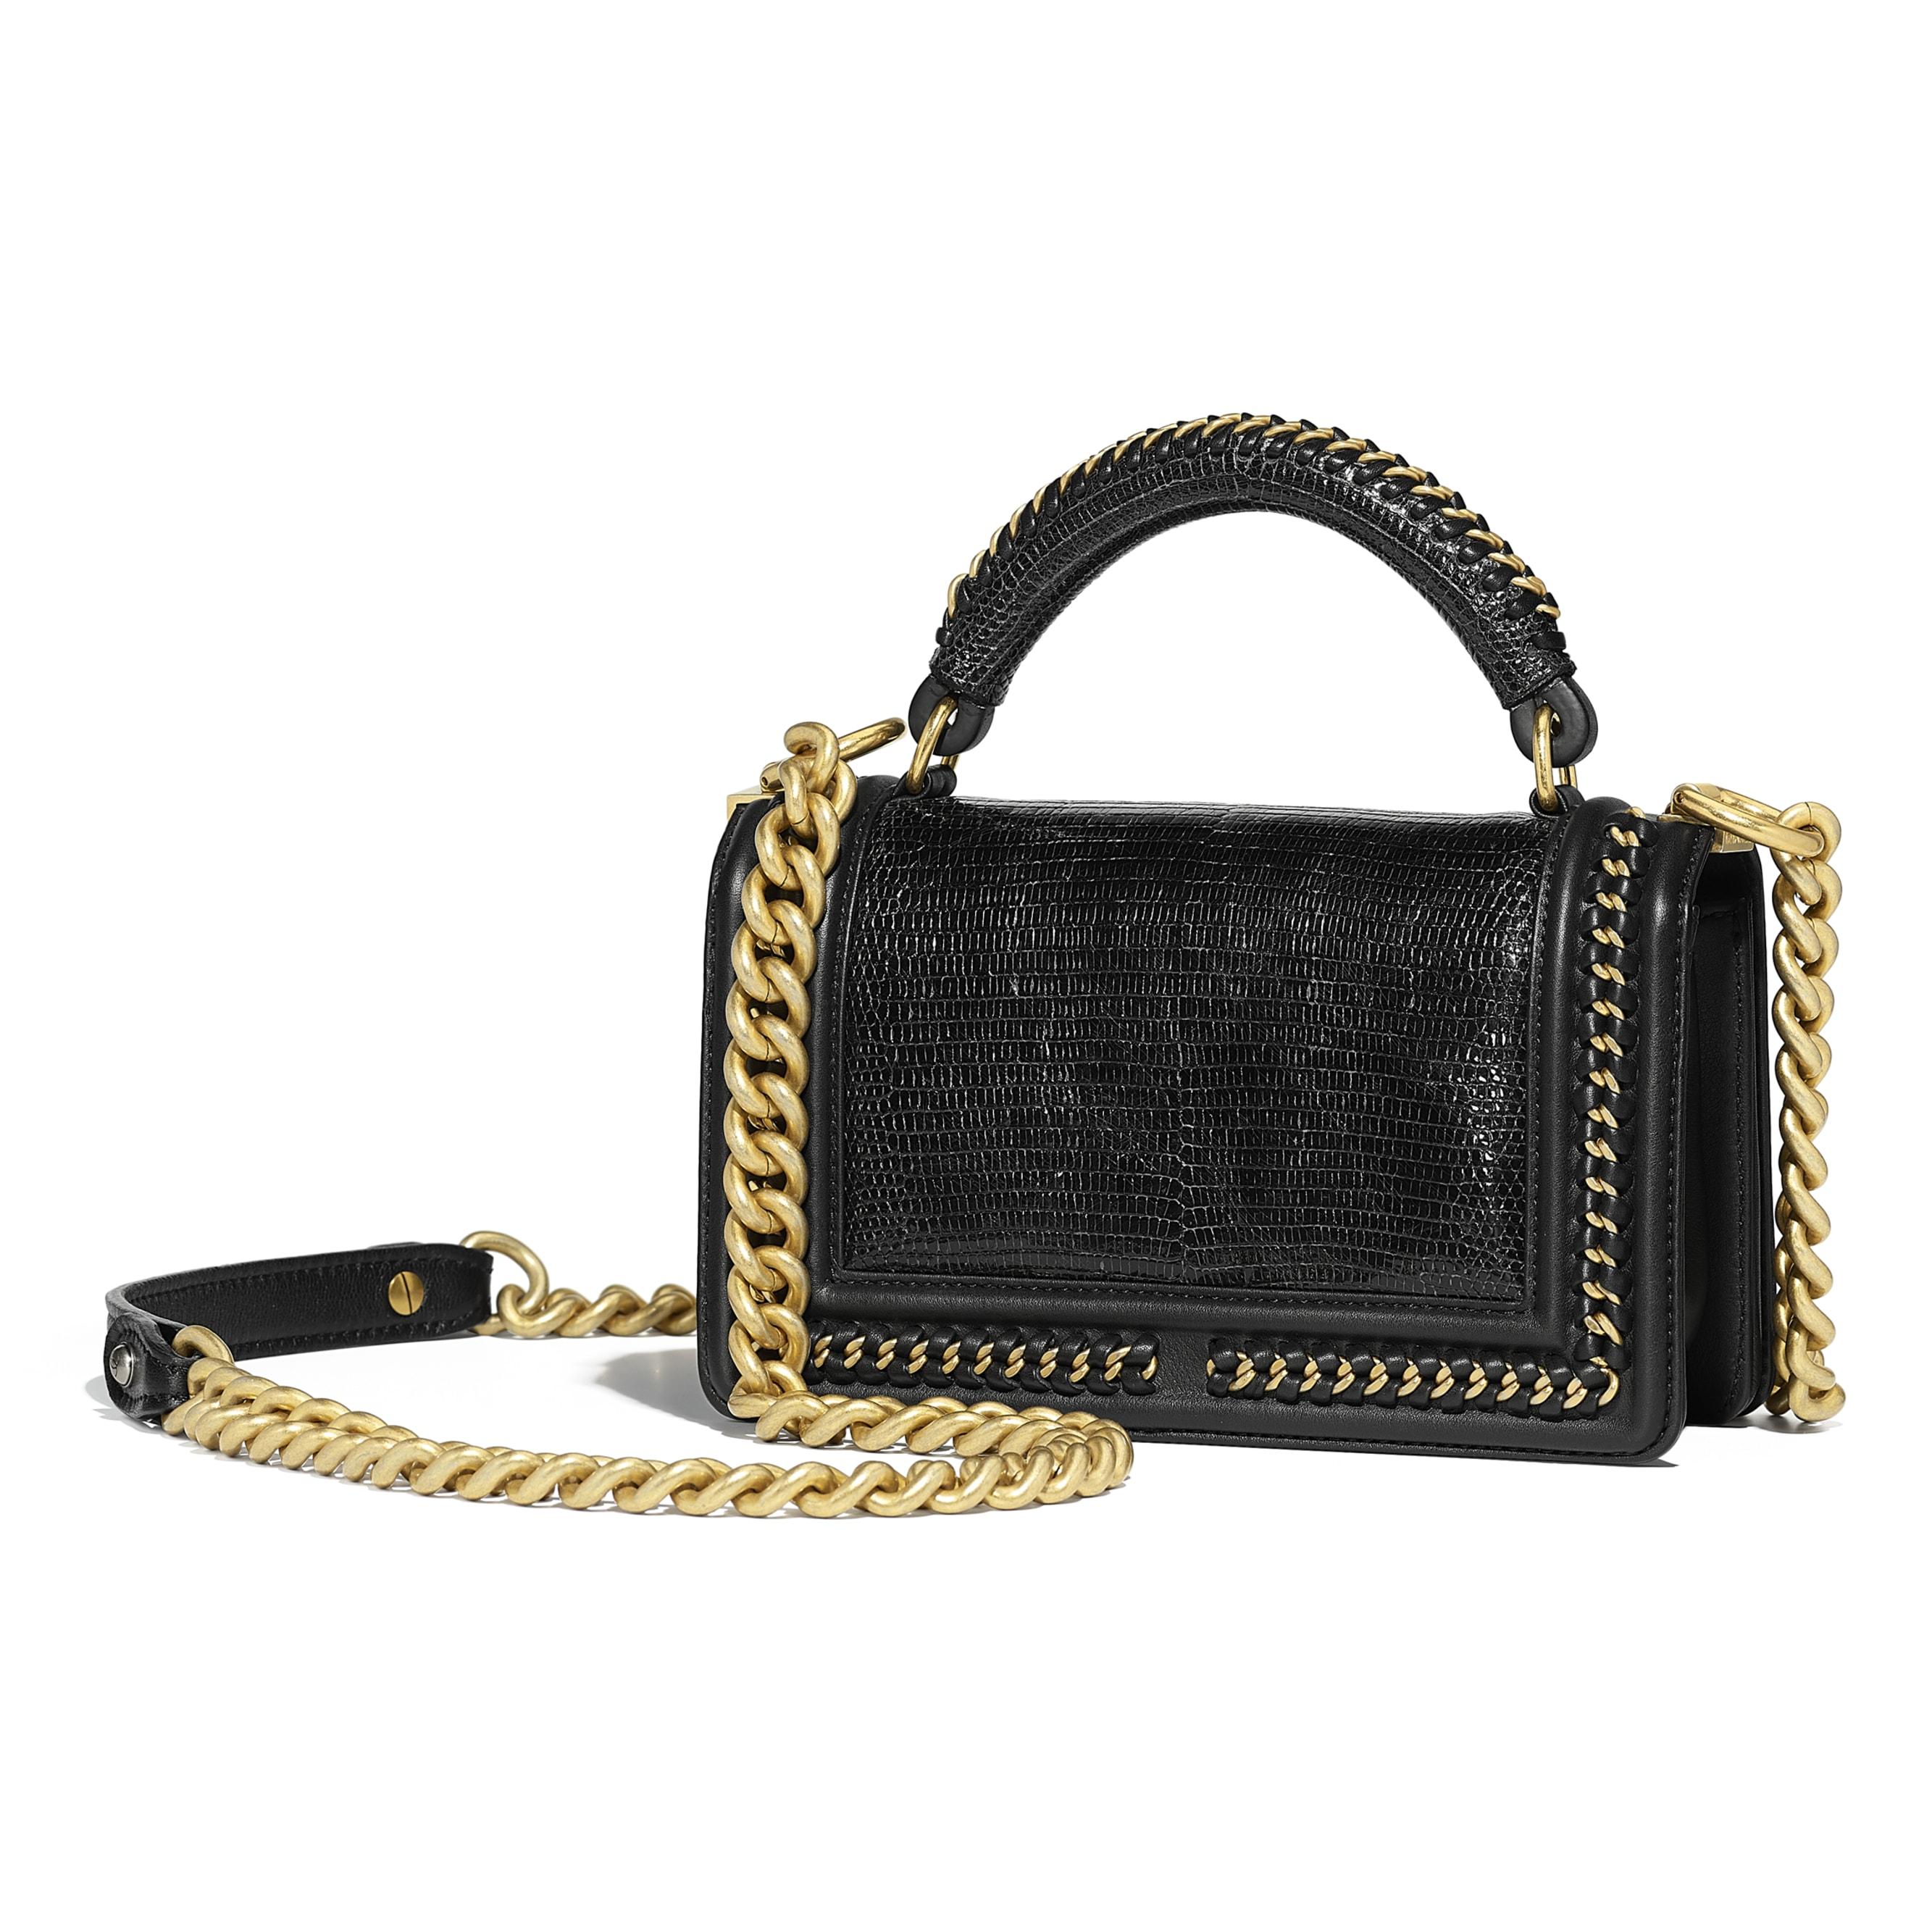 BOY CHANEL Flap Bag with Handle - Black - Lizard, Calfskin & Gold-Tone Metal - Alternative view - see standard sized version